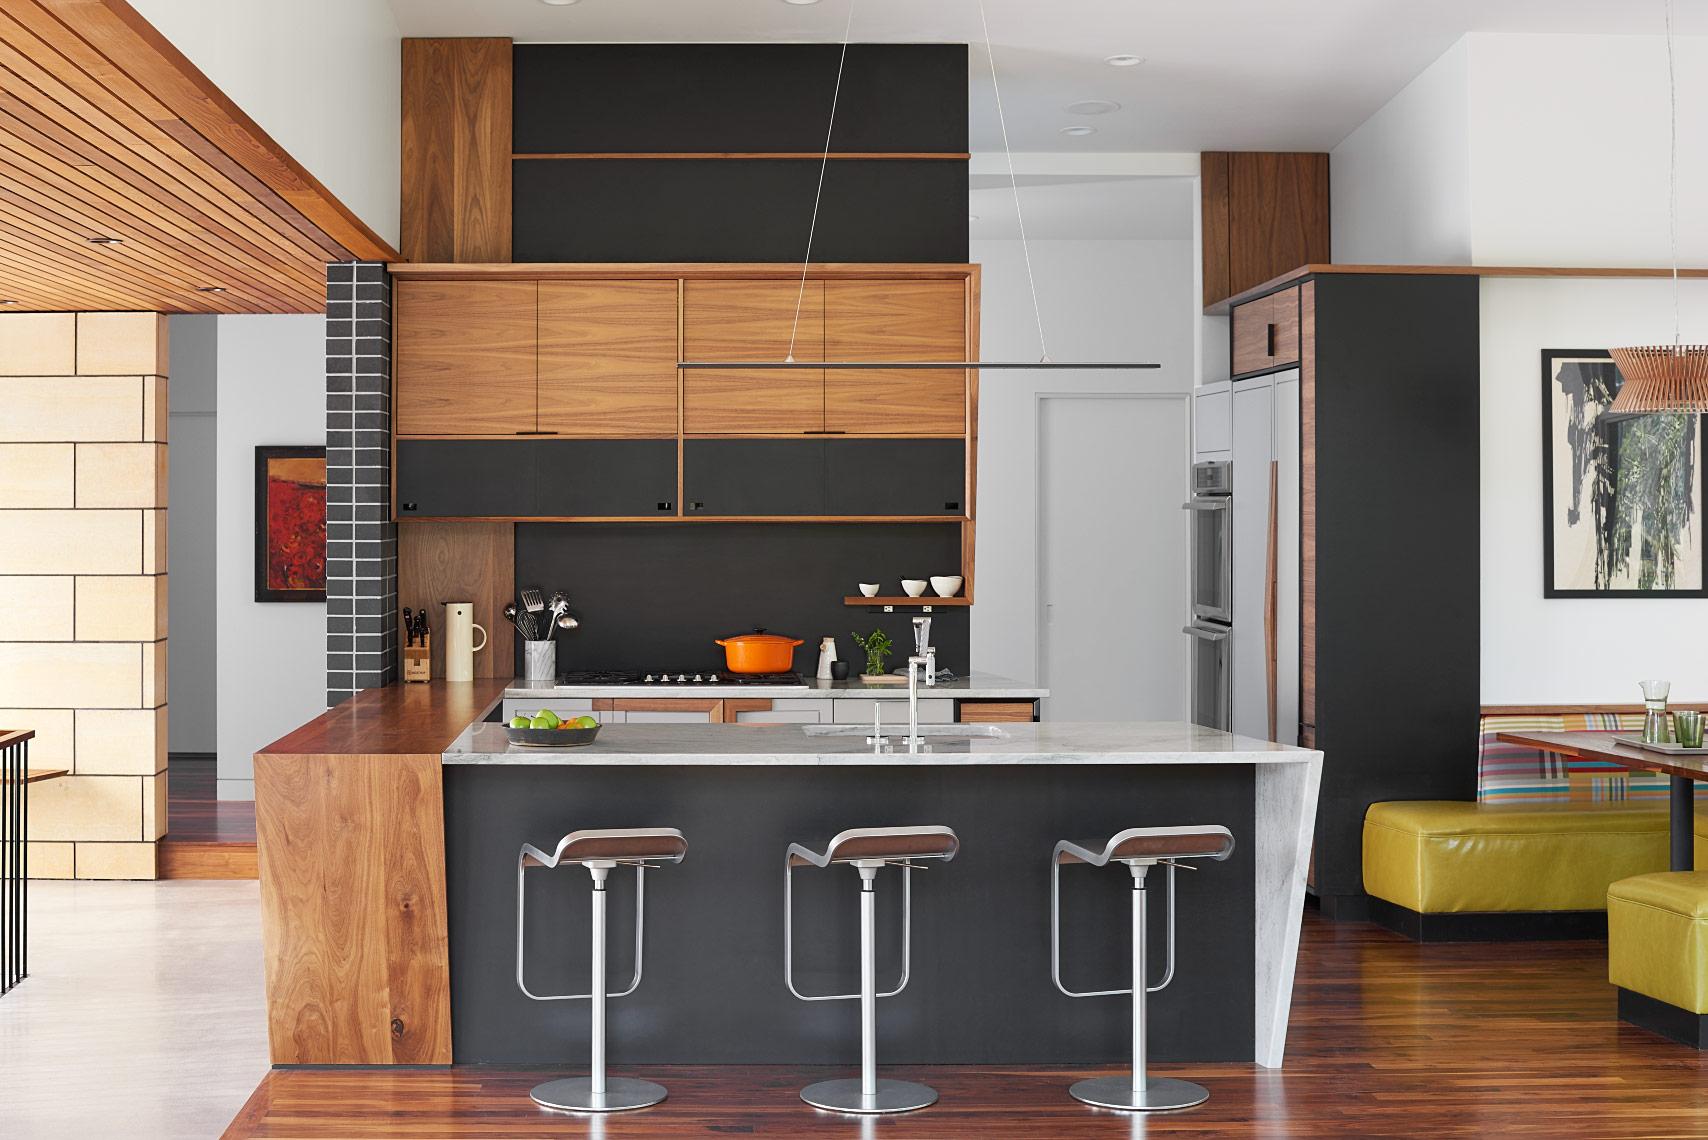 Kitchen design collaboration with Strand Design.